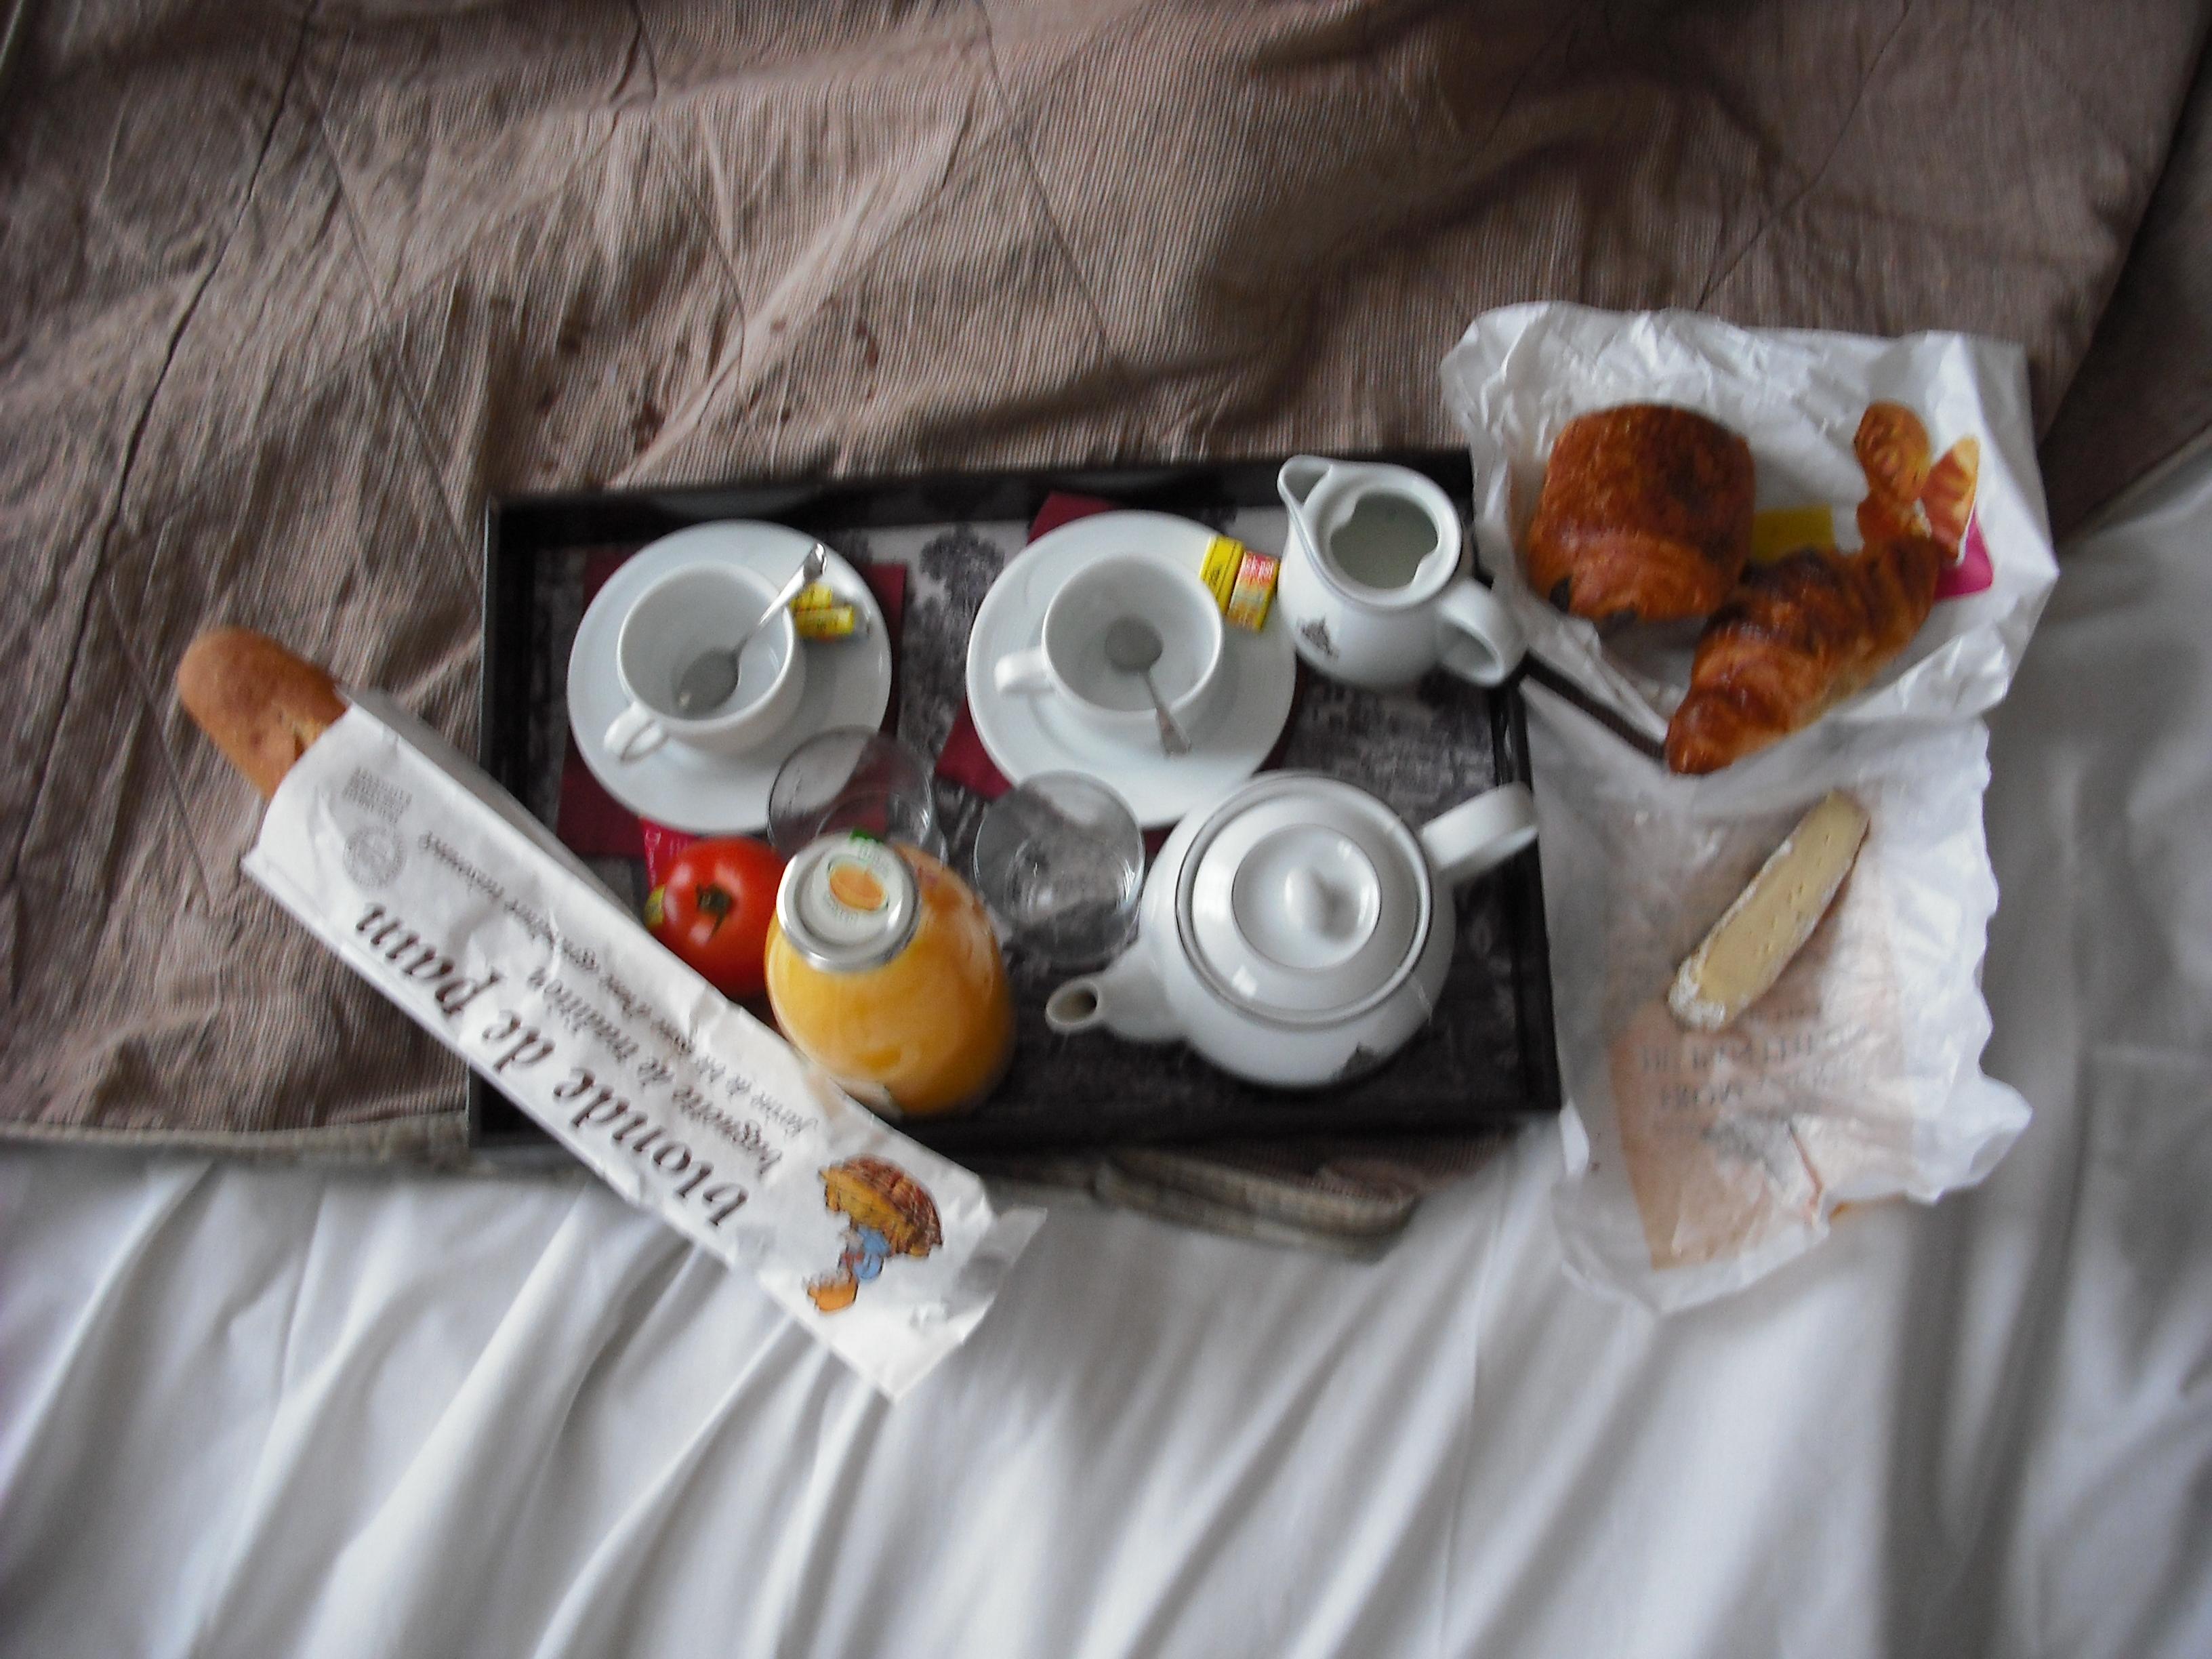 Breakfast in Bed | Flickr - Photo Sharing!